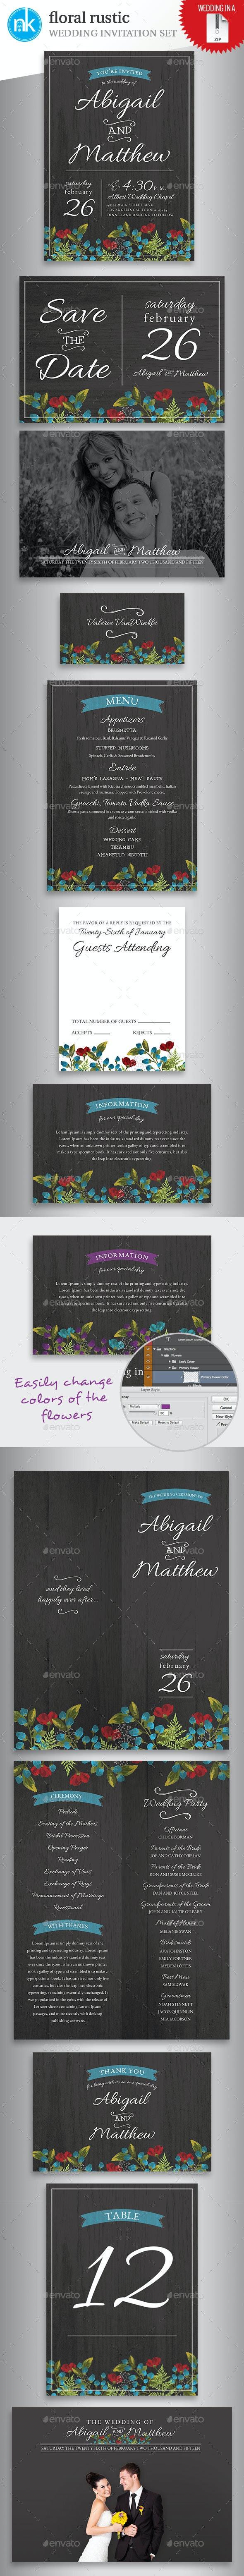 Floral Rustic Wedding Invitation Set - Weddings Cards & Invites